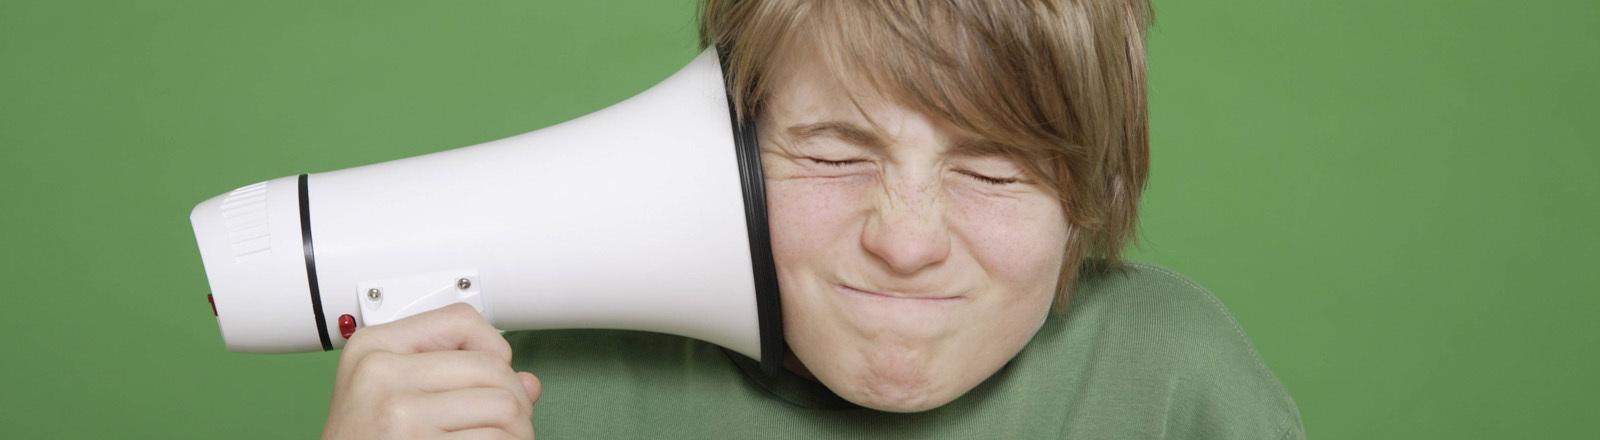 Junge hält sich Megaphon ans Ohr